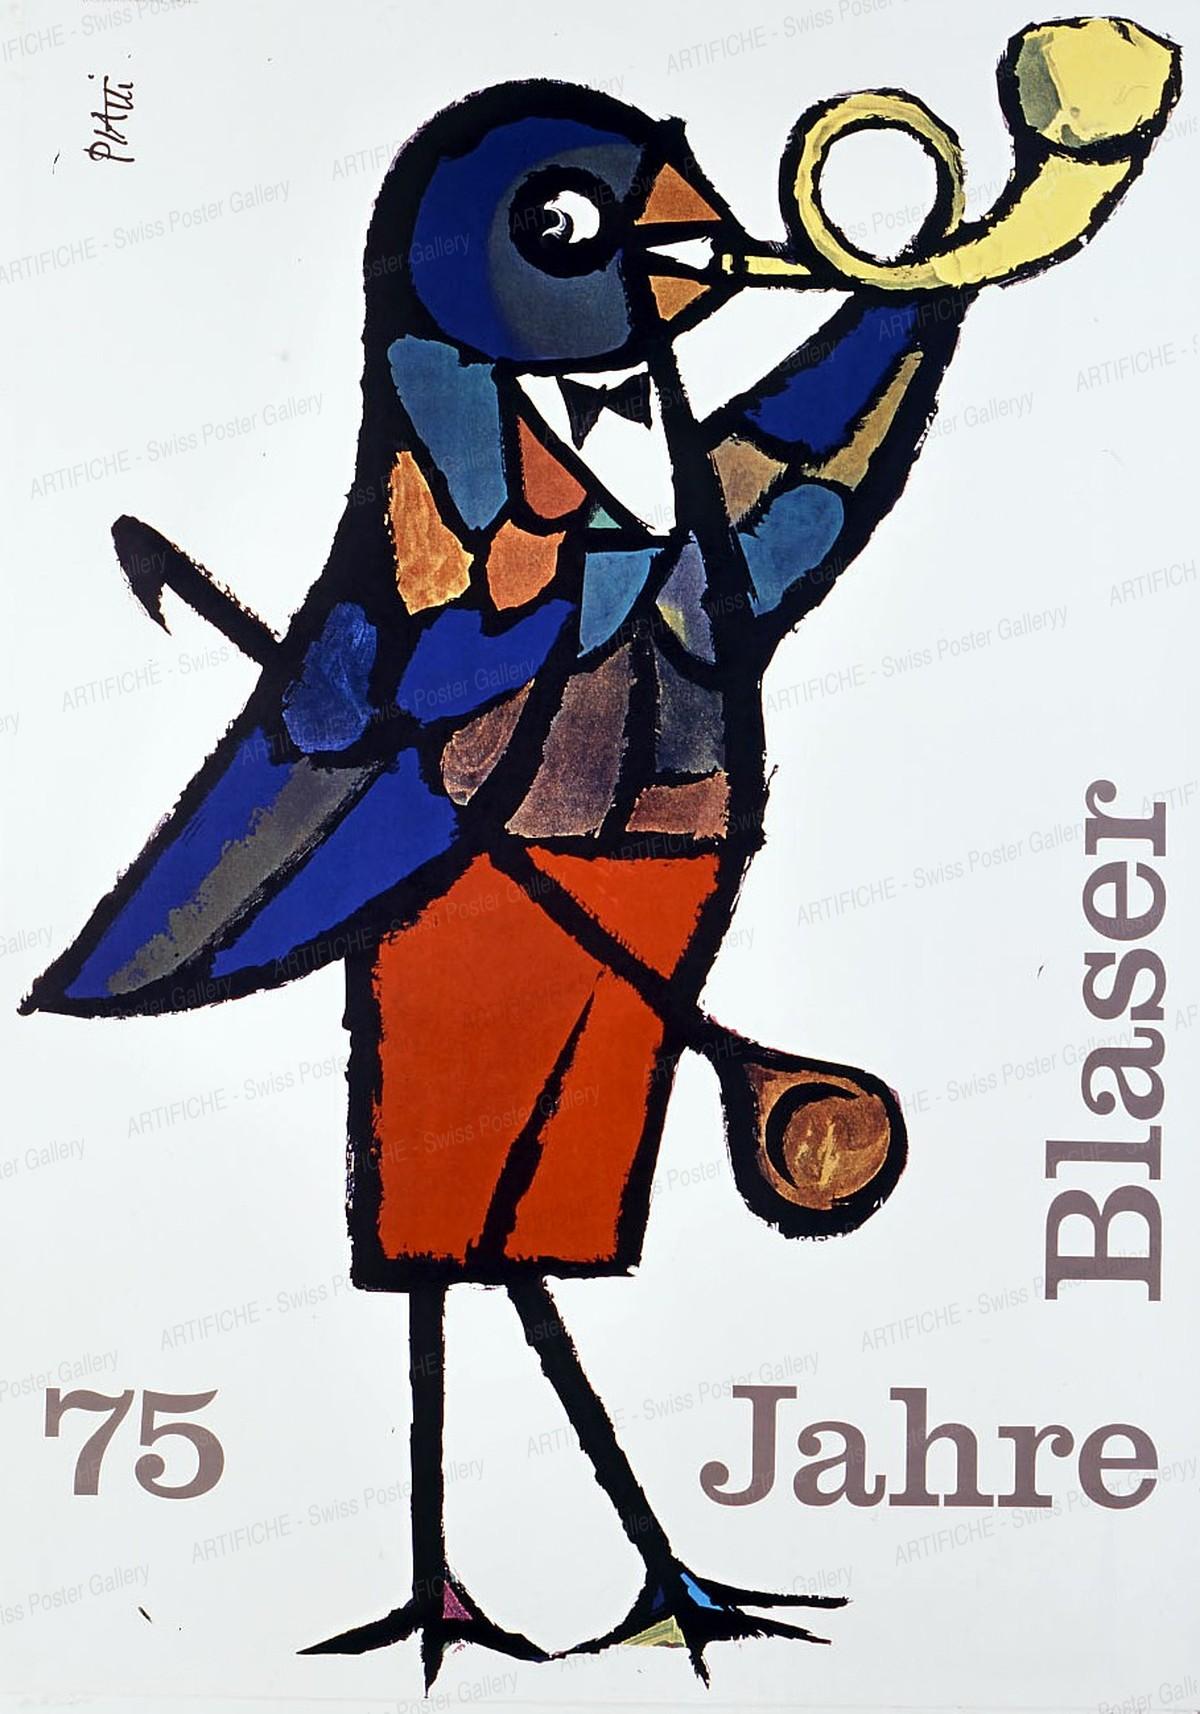 75 Jahre Blaser, Celestino Piatti